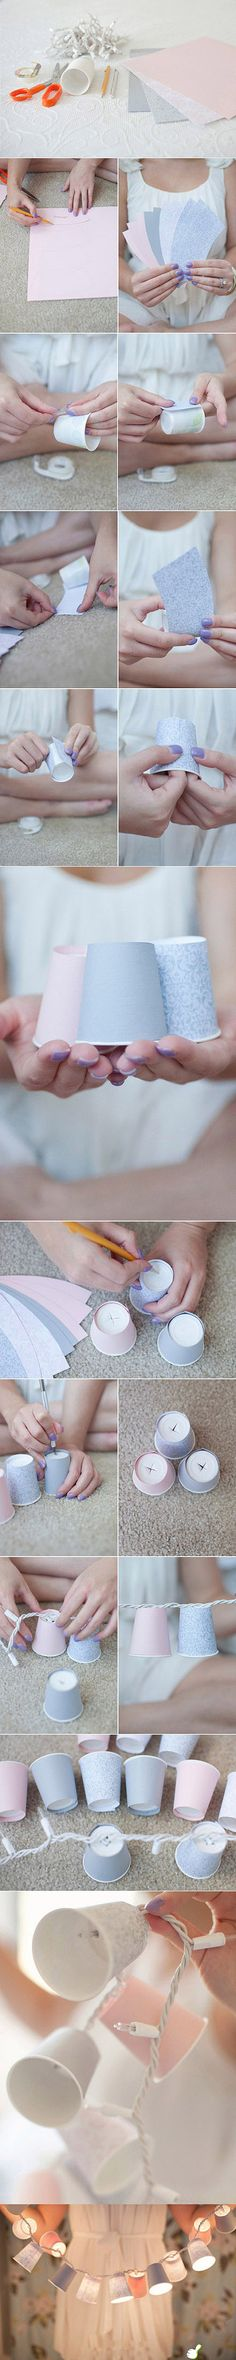 #crafts #DIY #homemade